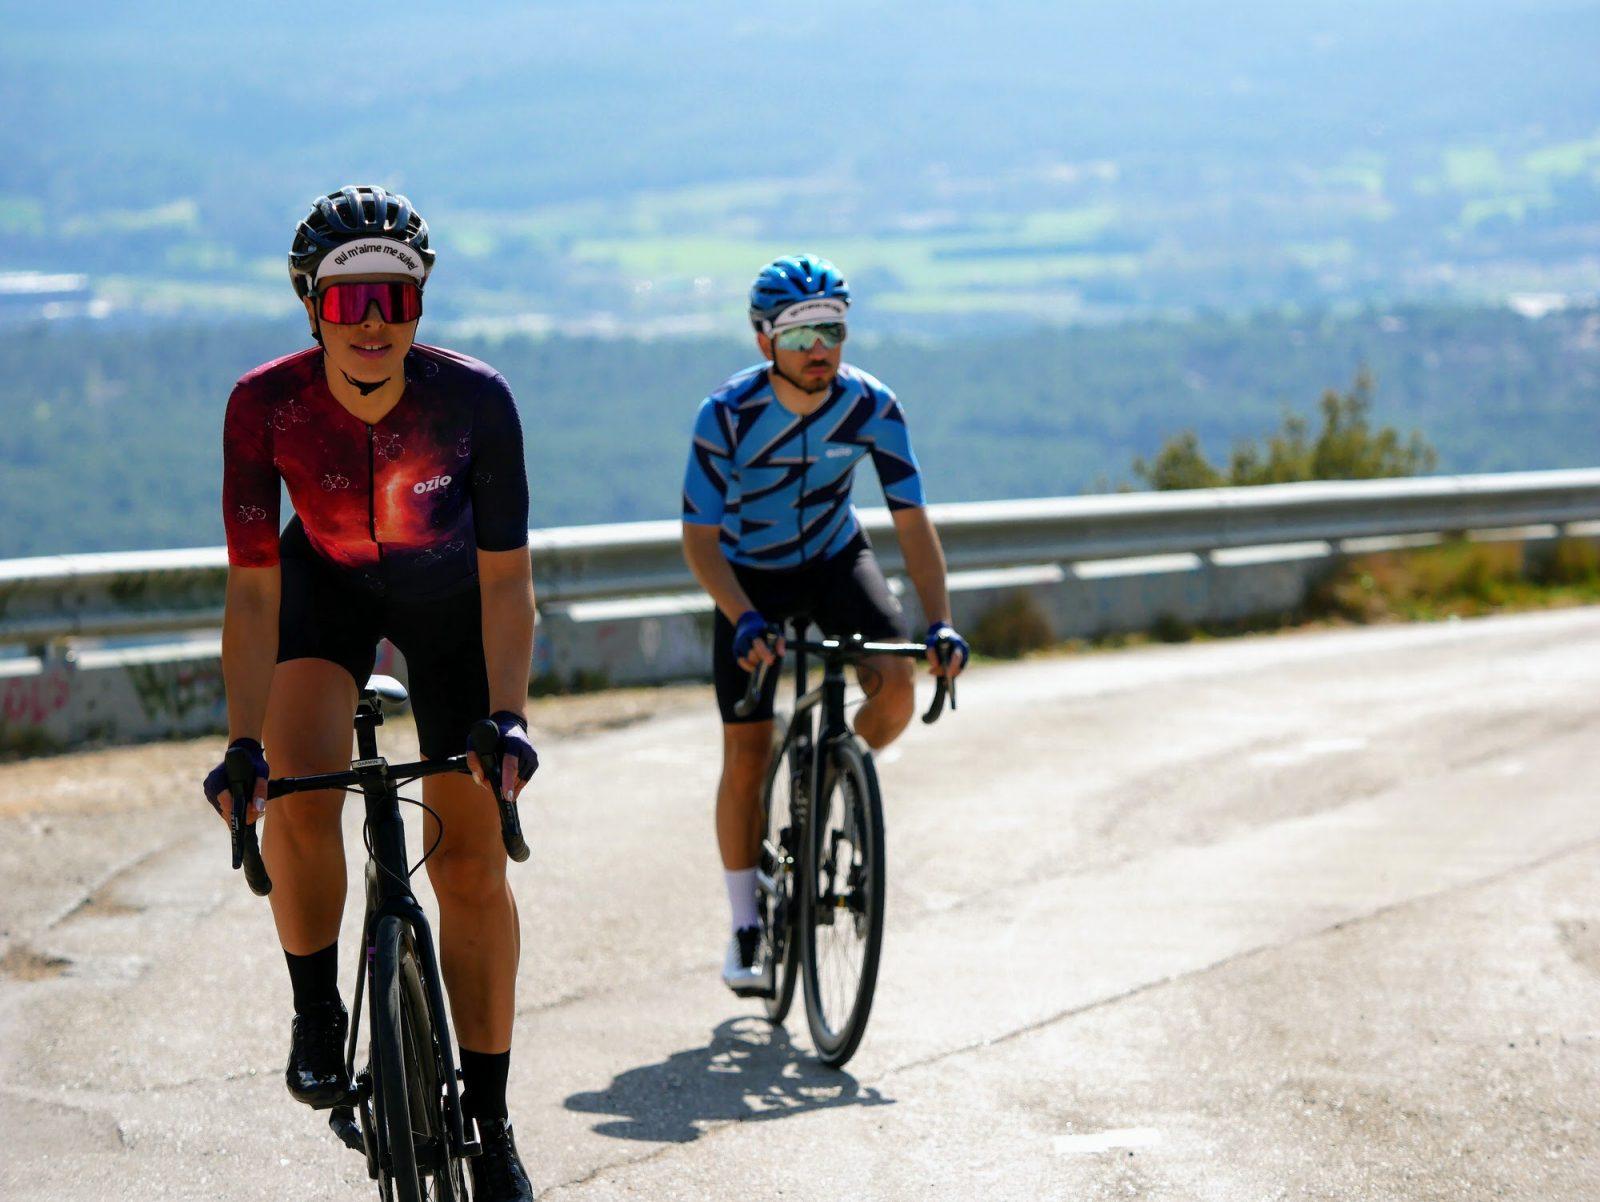 Duo cyclistes maillot de vélo été femme OZIO